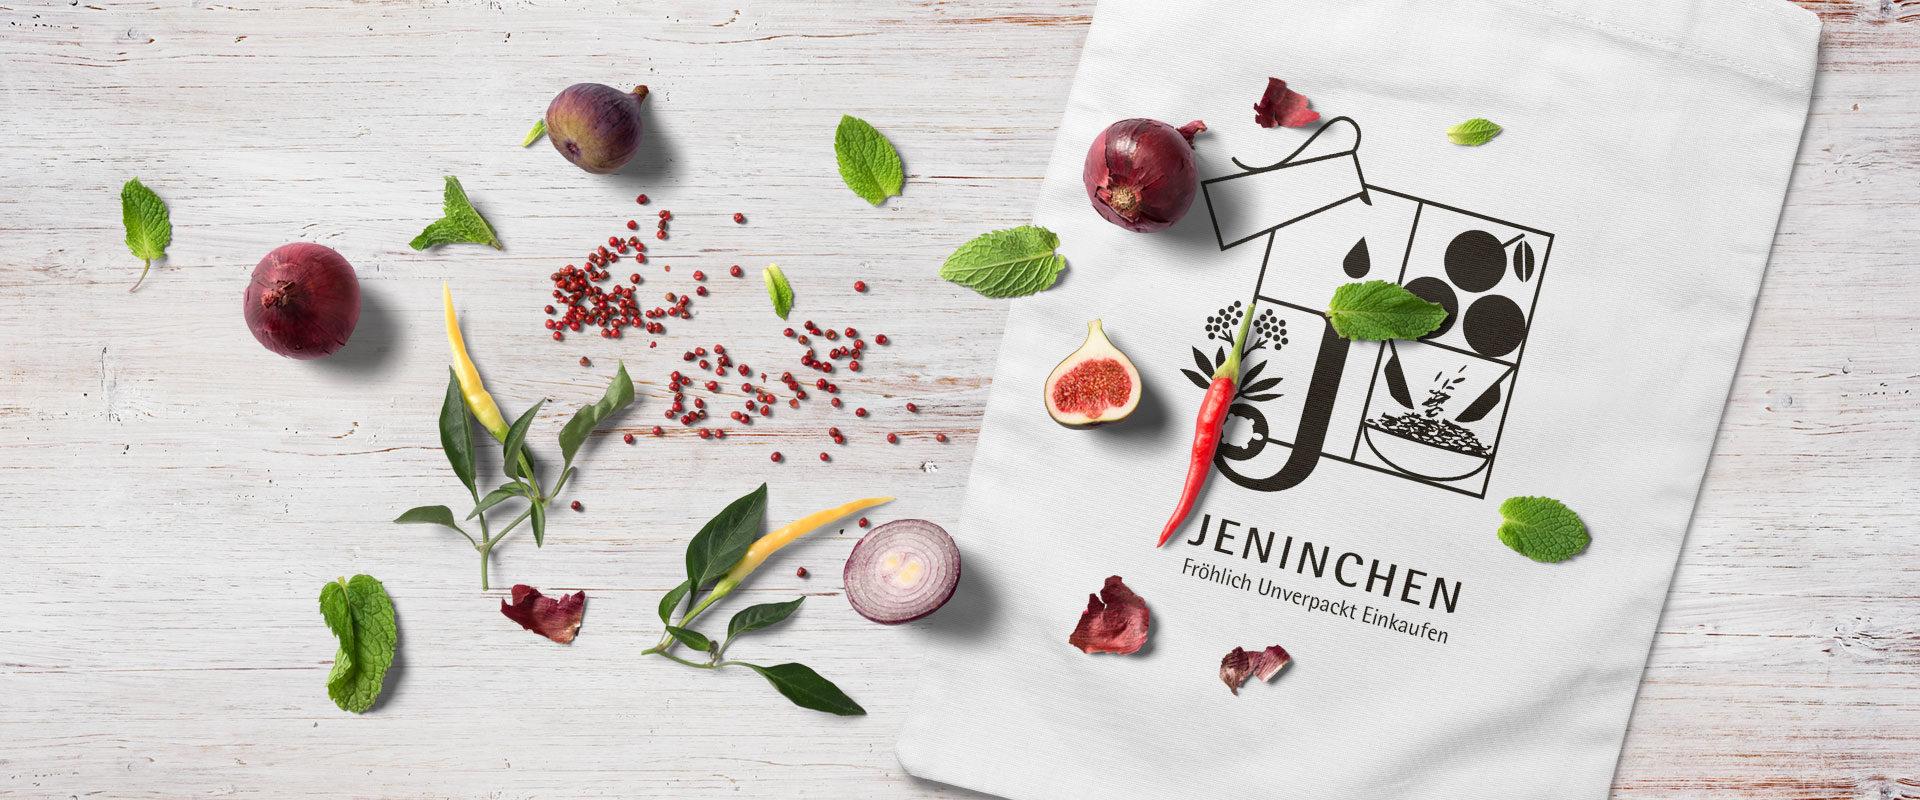 Jeninchen Unverpackt Laden Jena Thüringen